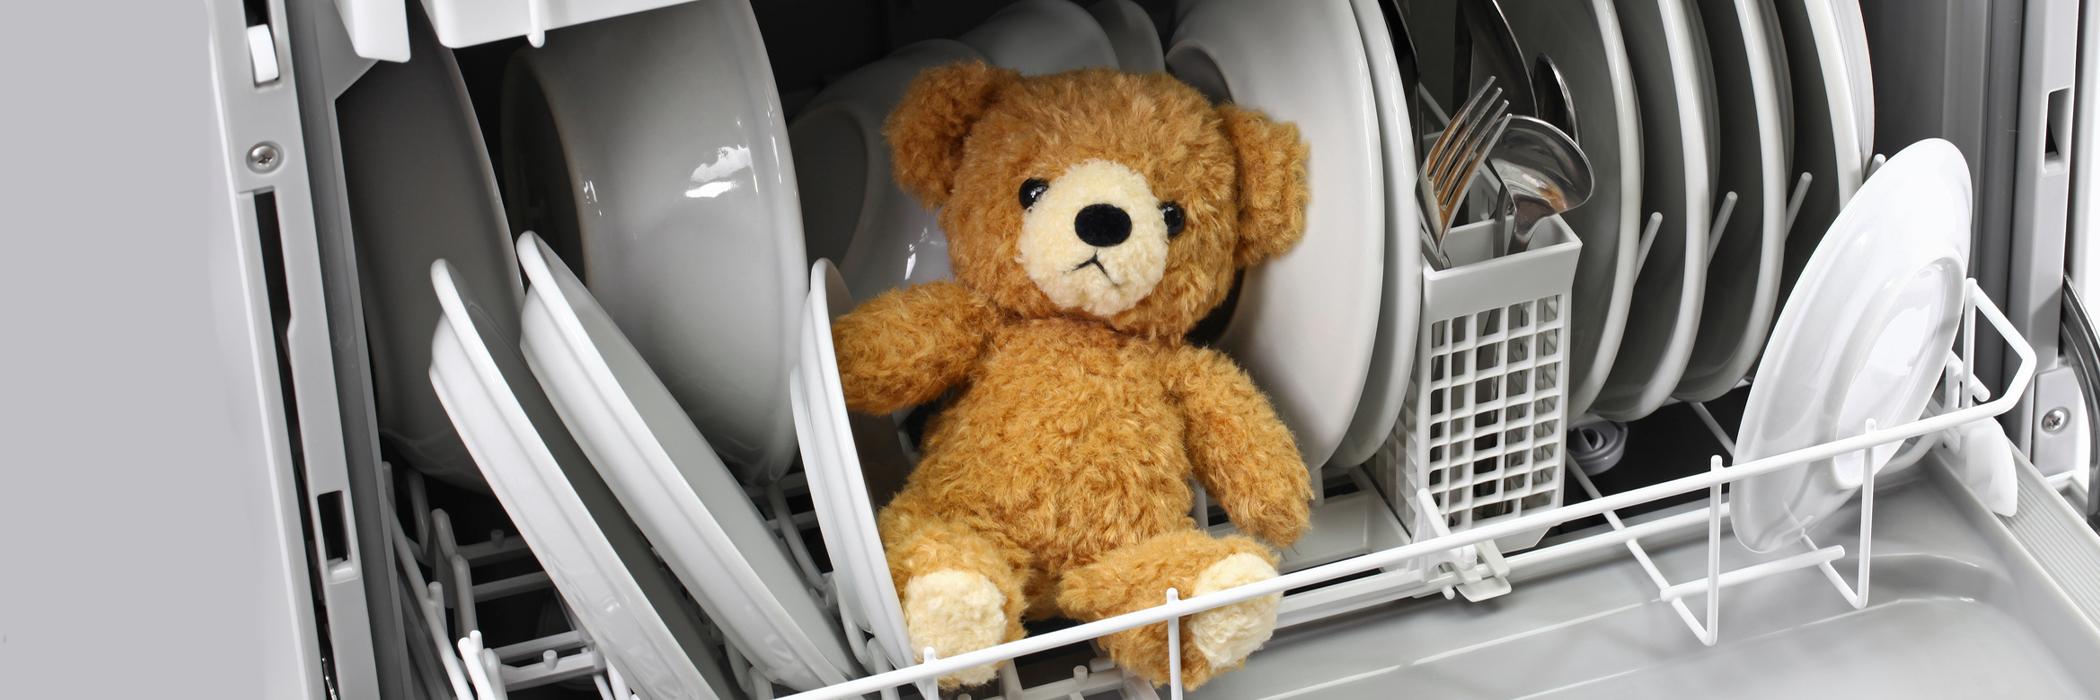 Teddy bear in the dishwasher.